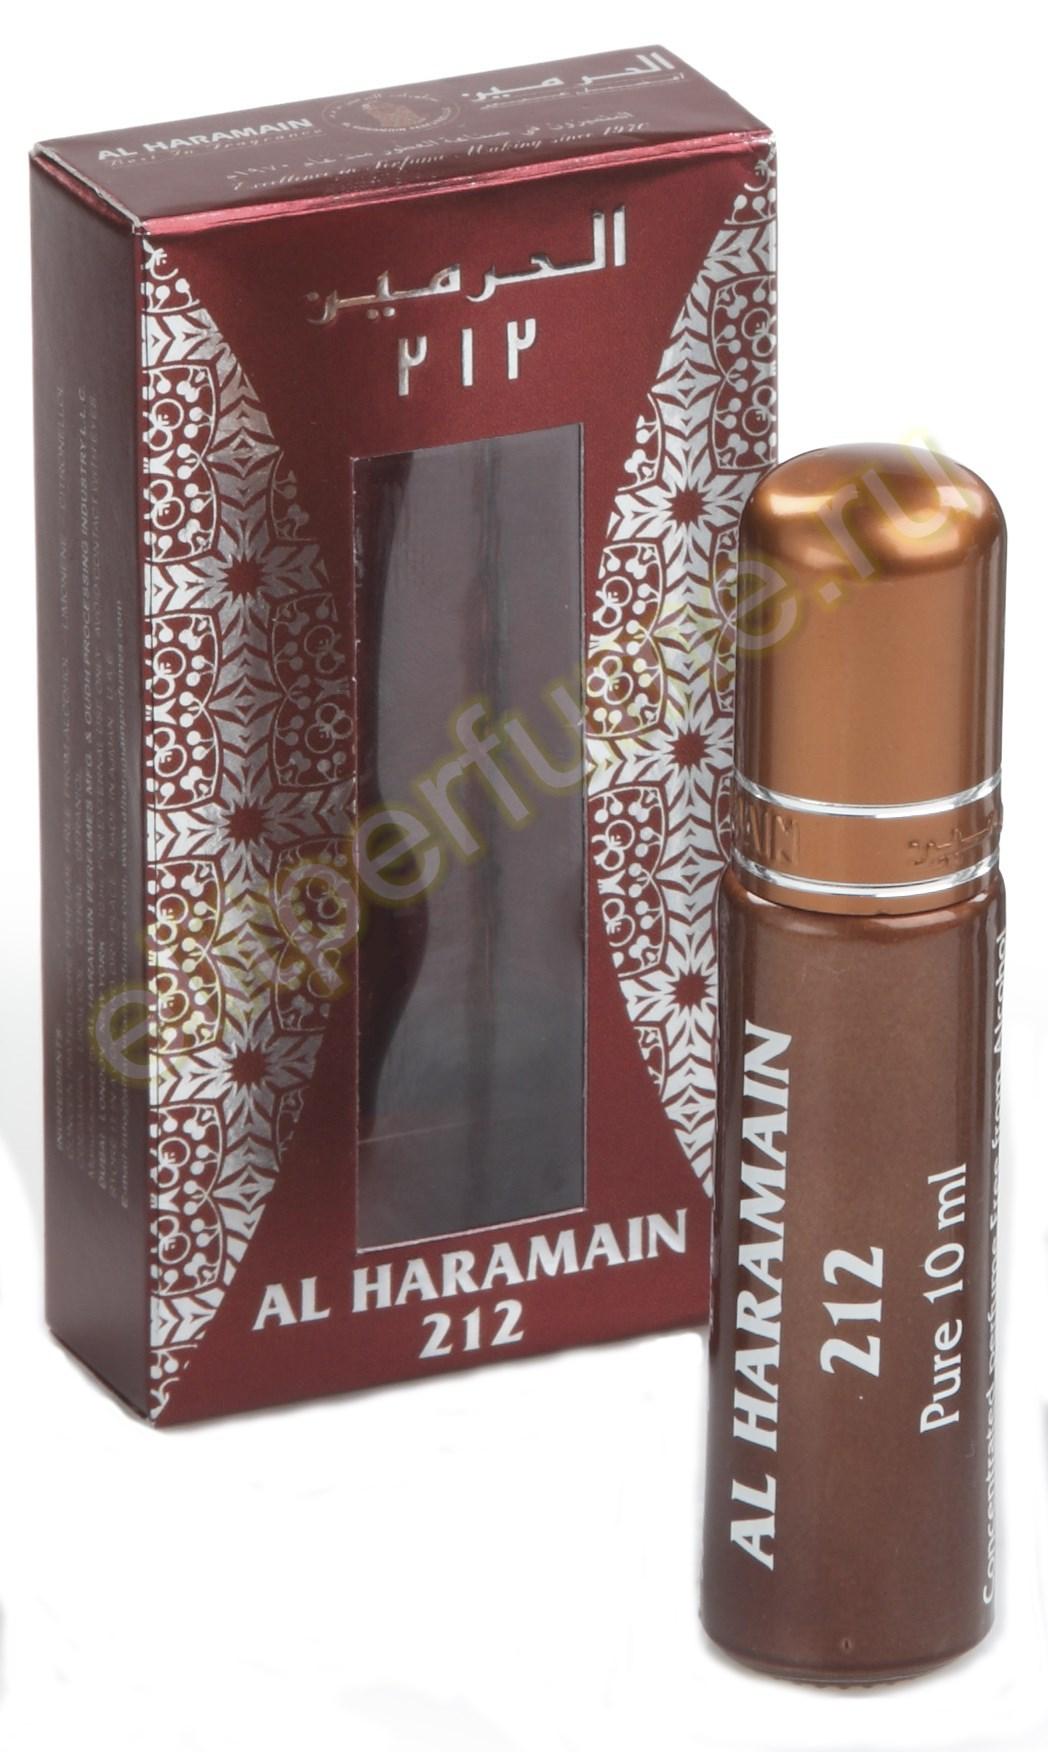 Аль-Харамайн 212 Al Haramain 212 10 мл арабские масляные духи от Аль Харамайн Al Haramain Perfumes